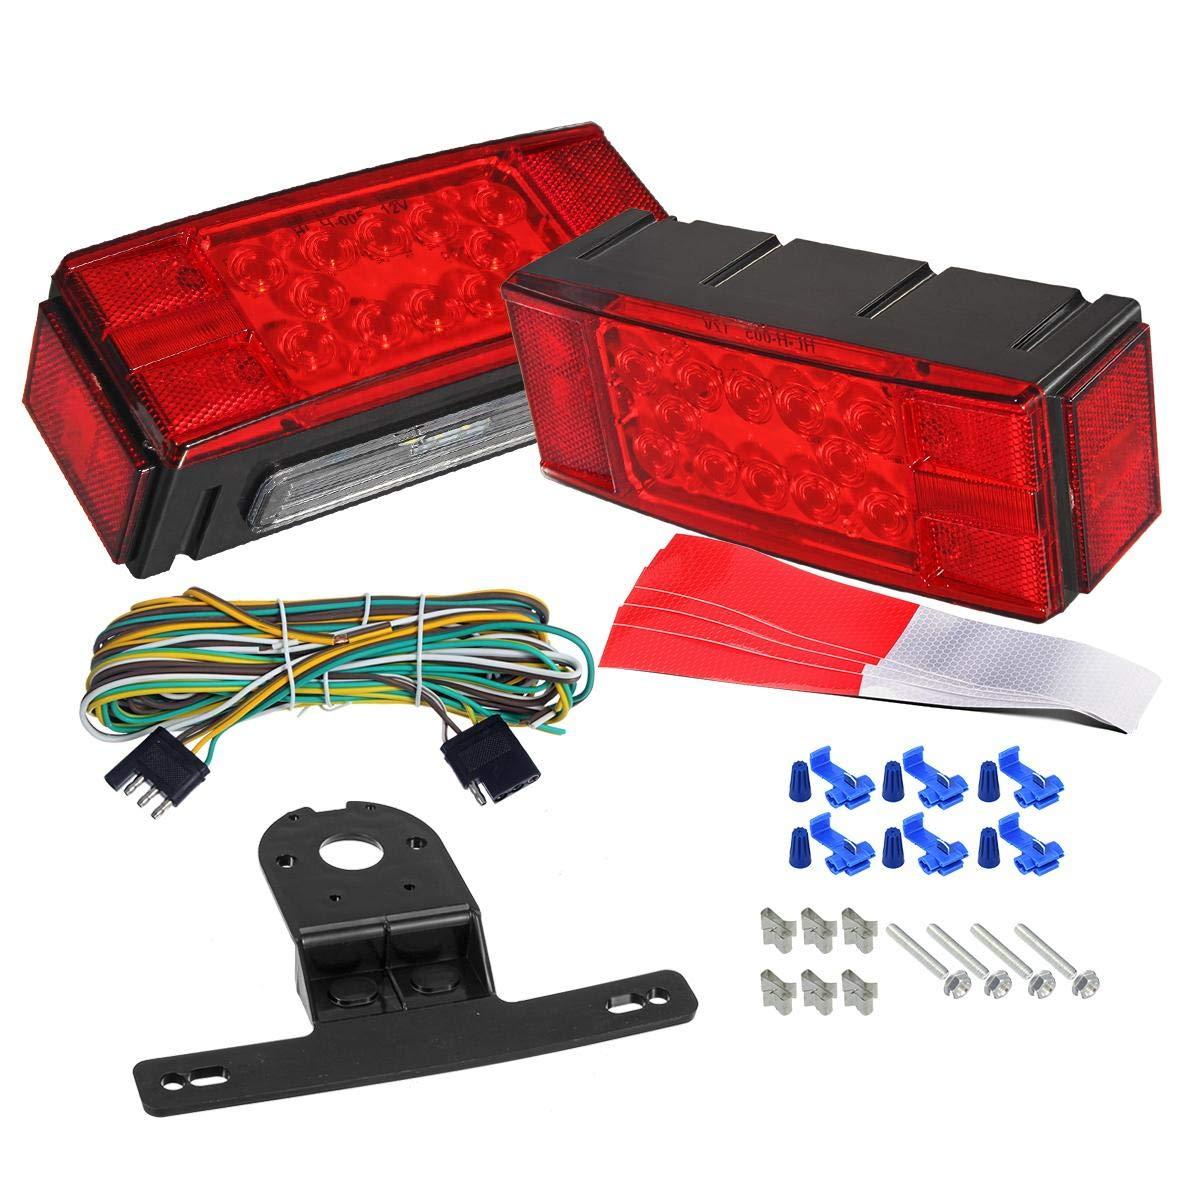 2PCS LIMICAR 12V Square LED Trailer Light Kit Red White LED Stop Turn Tail License Brake Running Lights for Trailer Truck Marine RV Boat Camper Snowmobile Waterproof